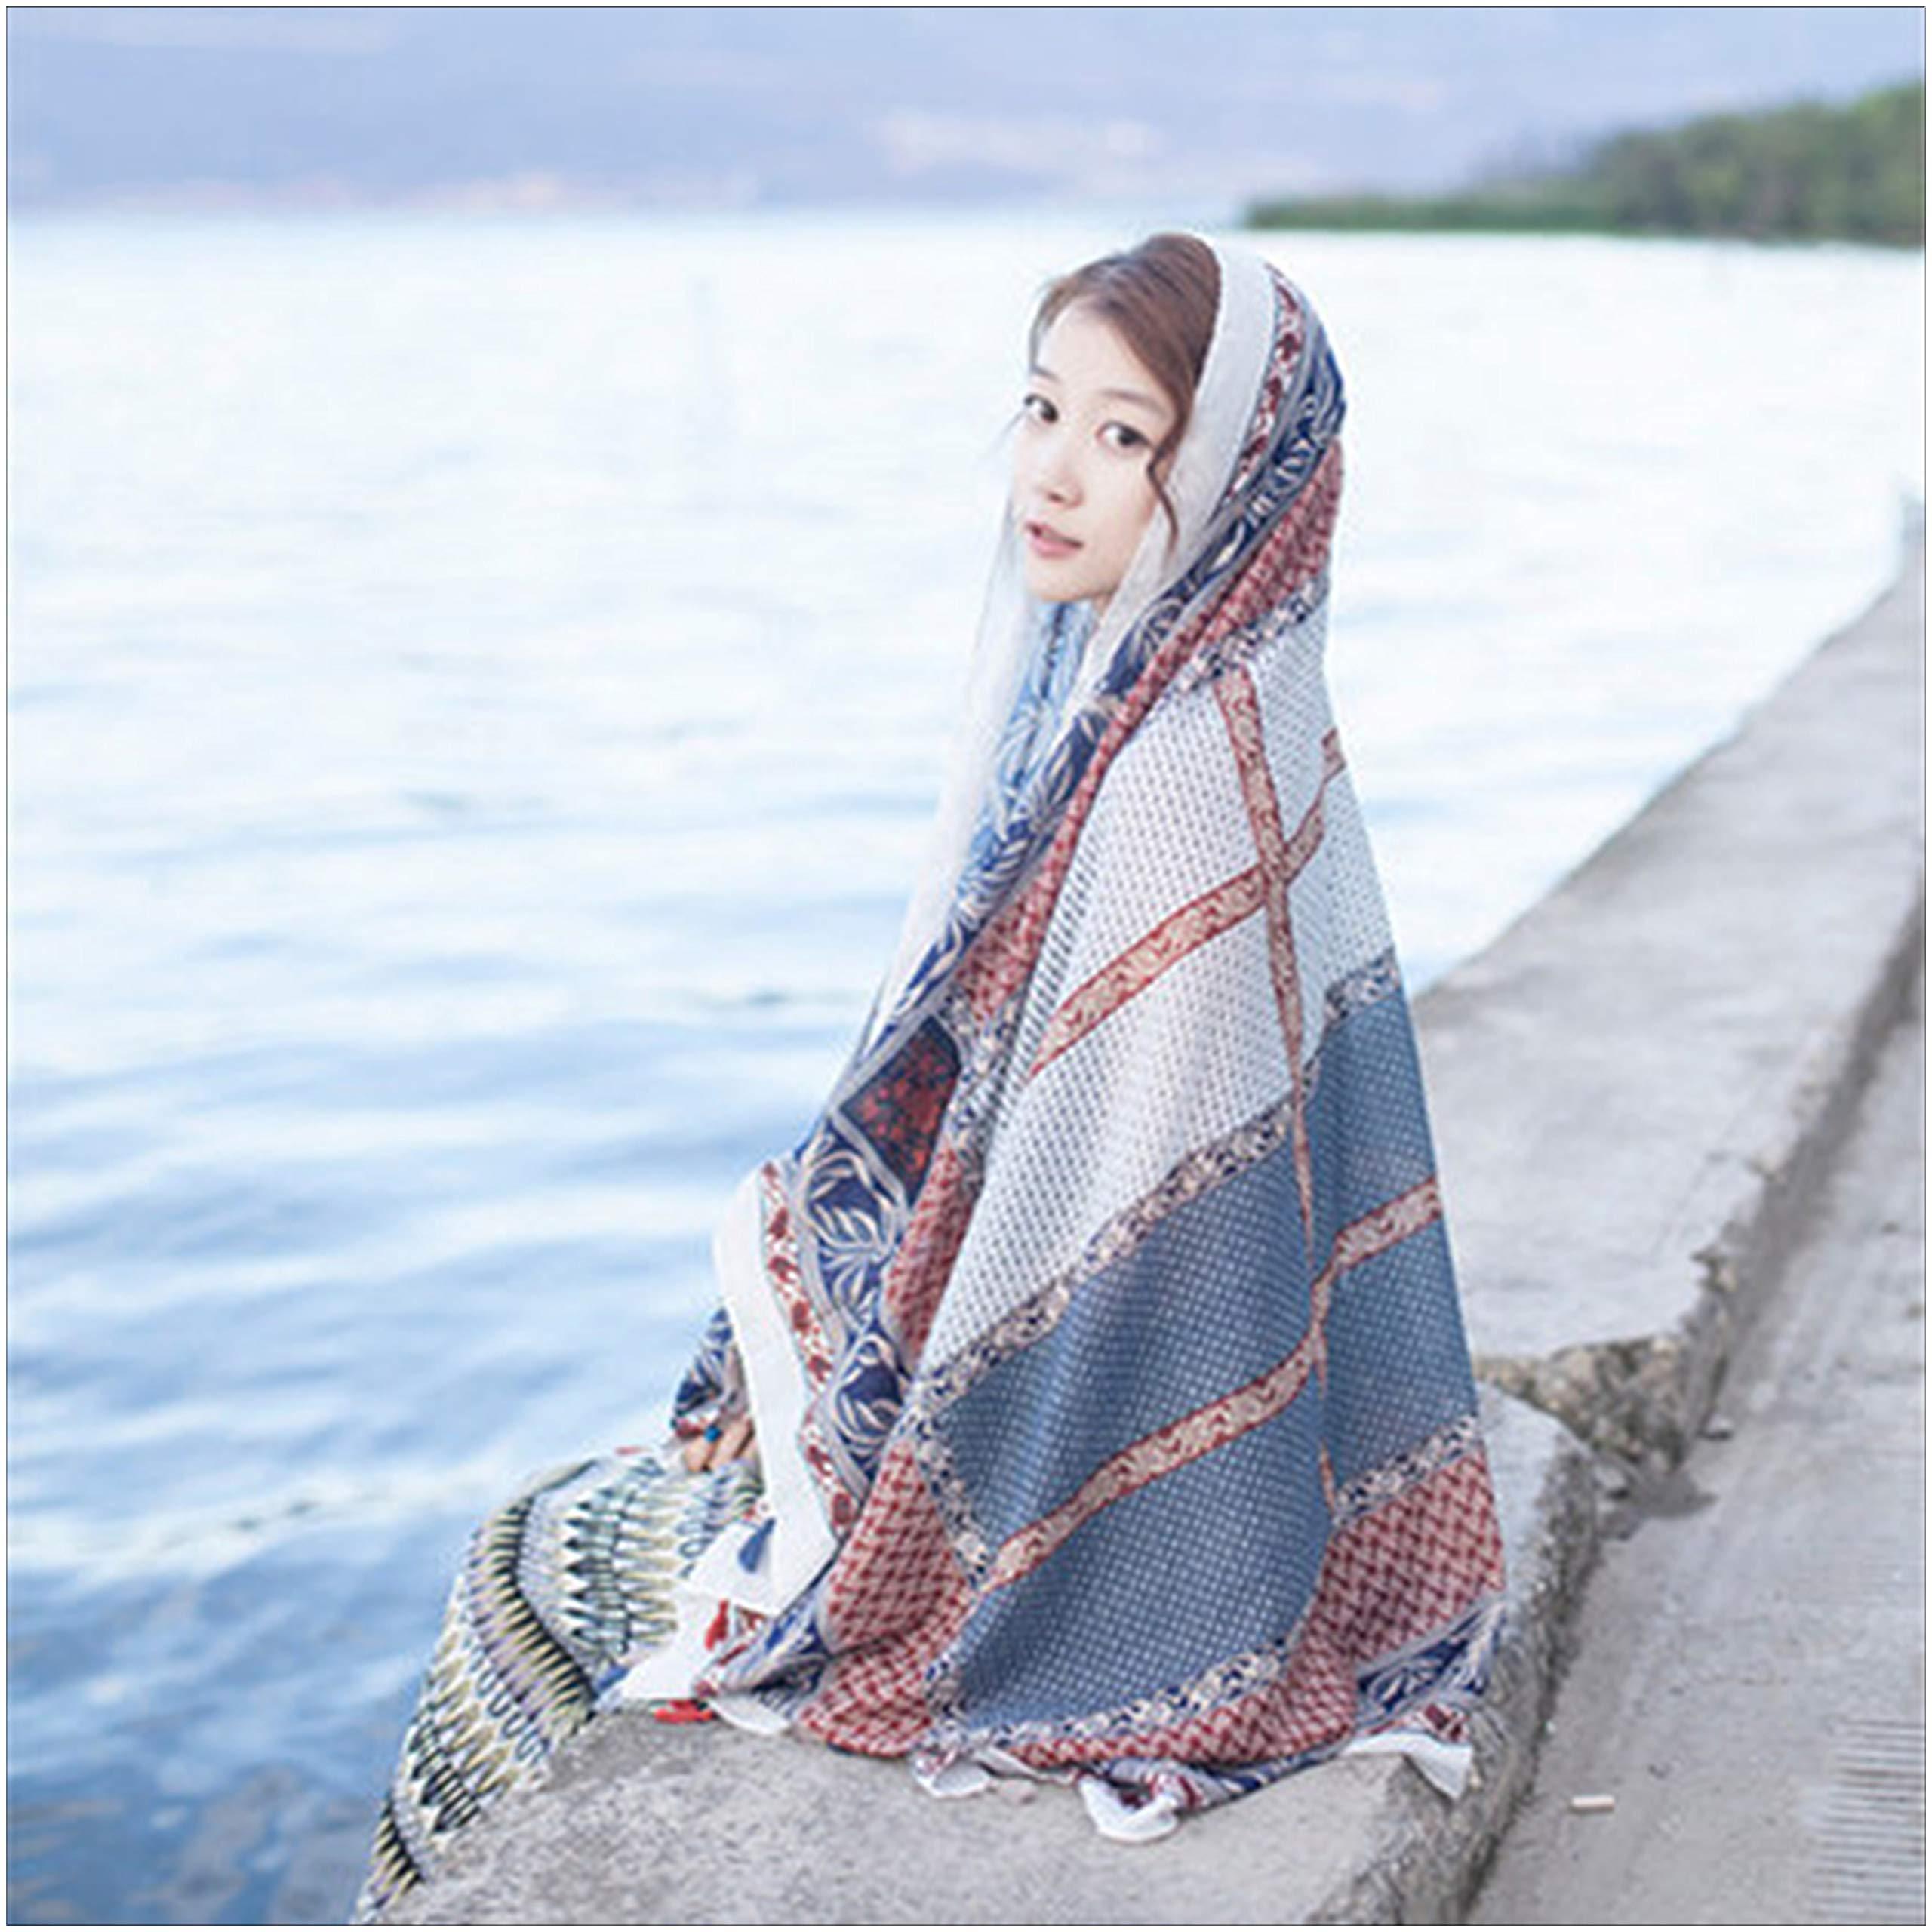 Fashion Women Scarf Joyous Large Soft Cozy Lightweight Sunscreen Shawl Wrap Scarf Pashmina Seaside Travel Beach Towel (Block)